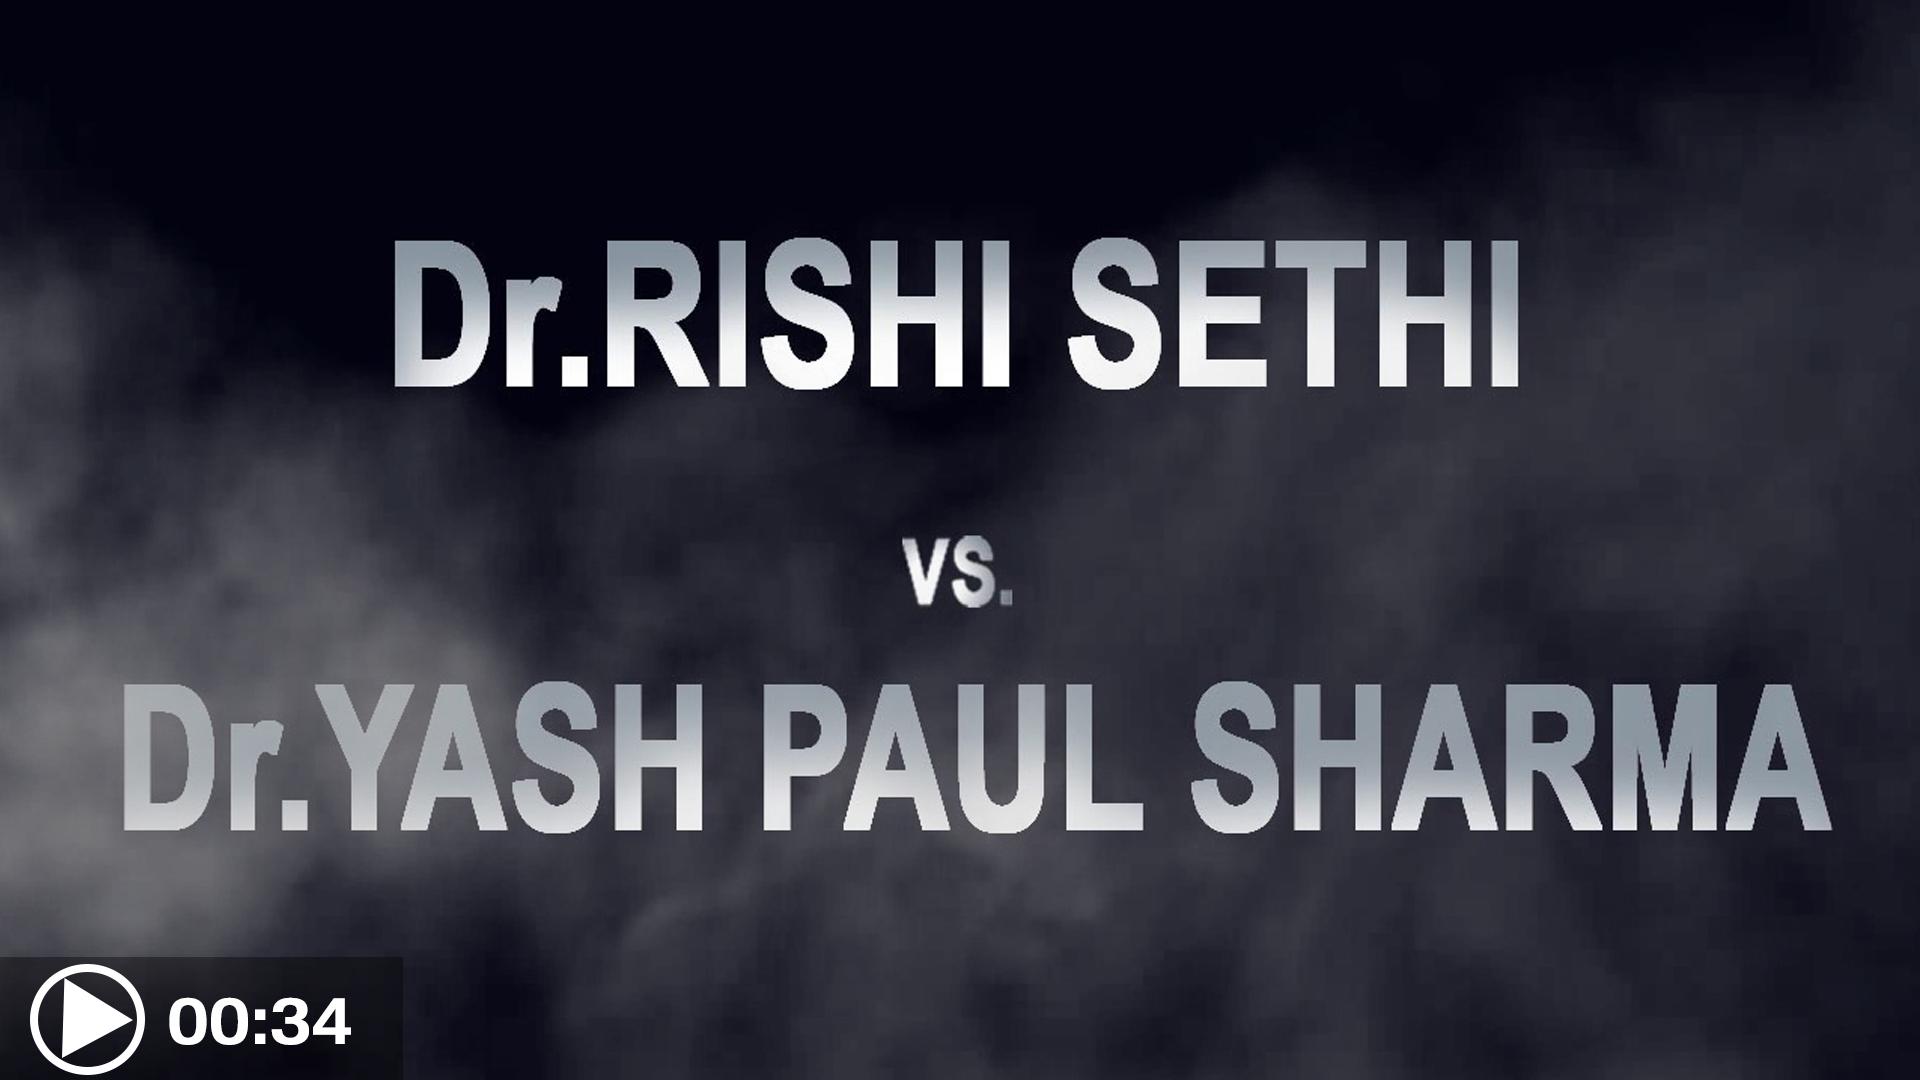 The Big Debate: Dr.Rishi Sethi vs Dr.Yash Paul Sharma